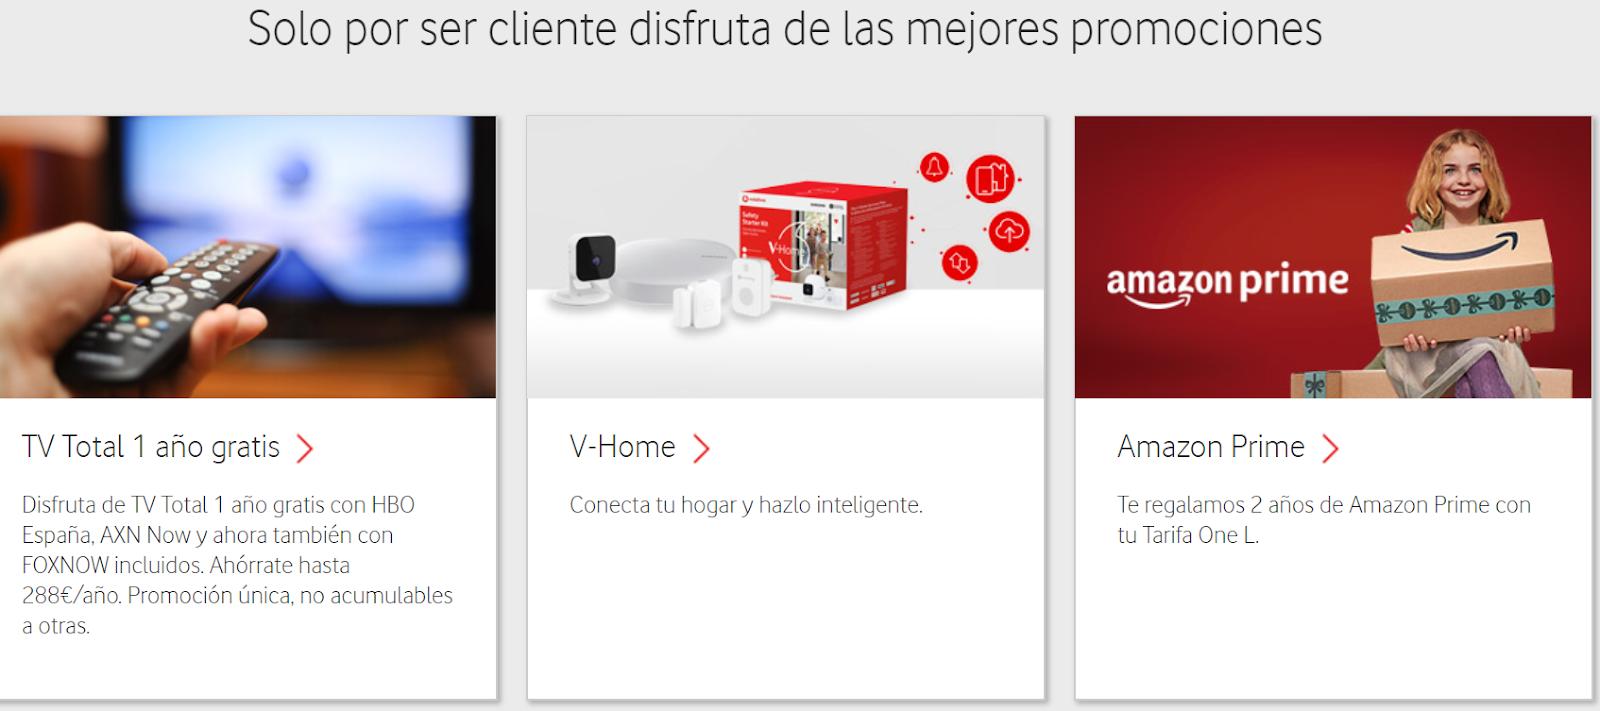 Promoción Vodafone actuales clientes